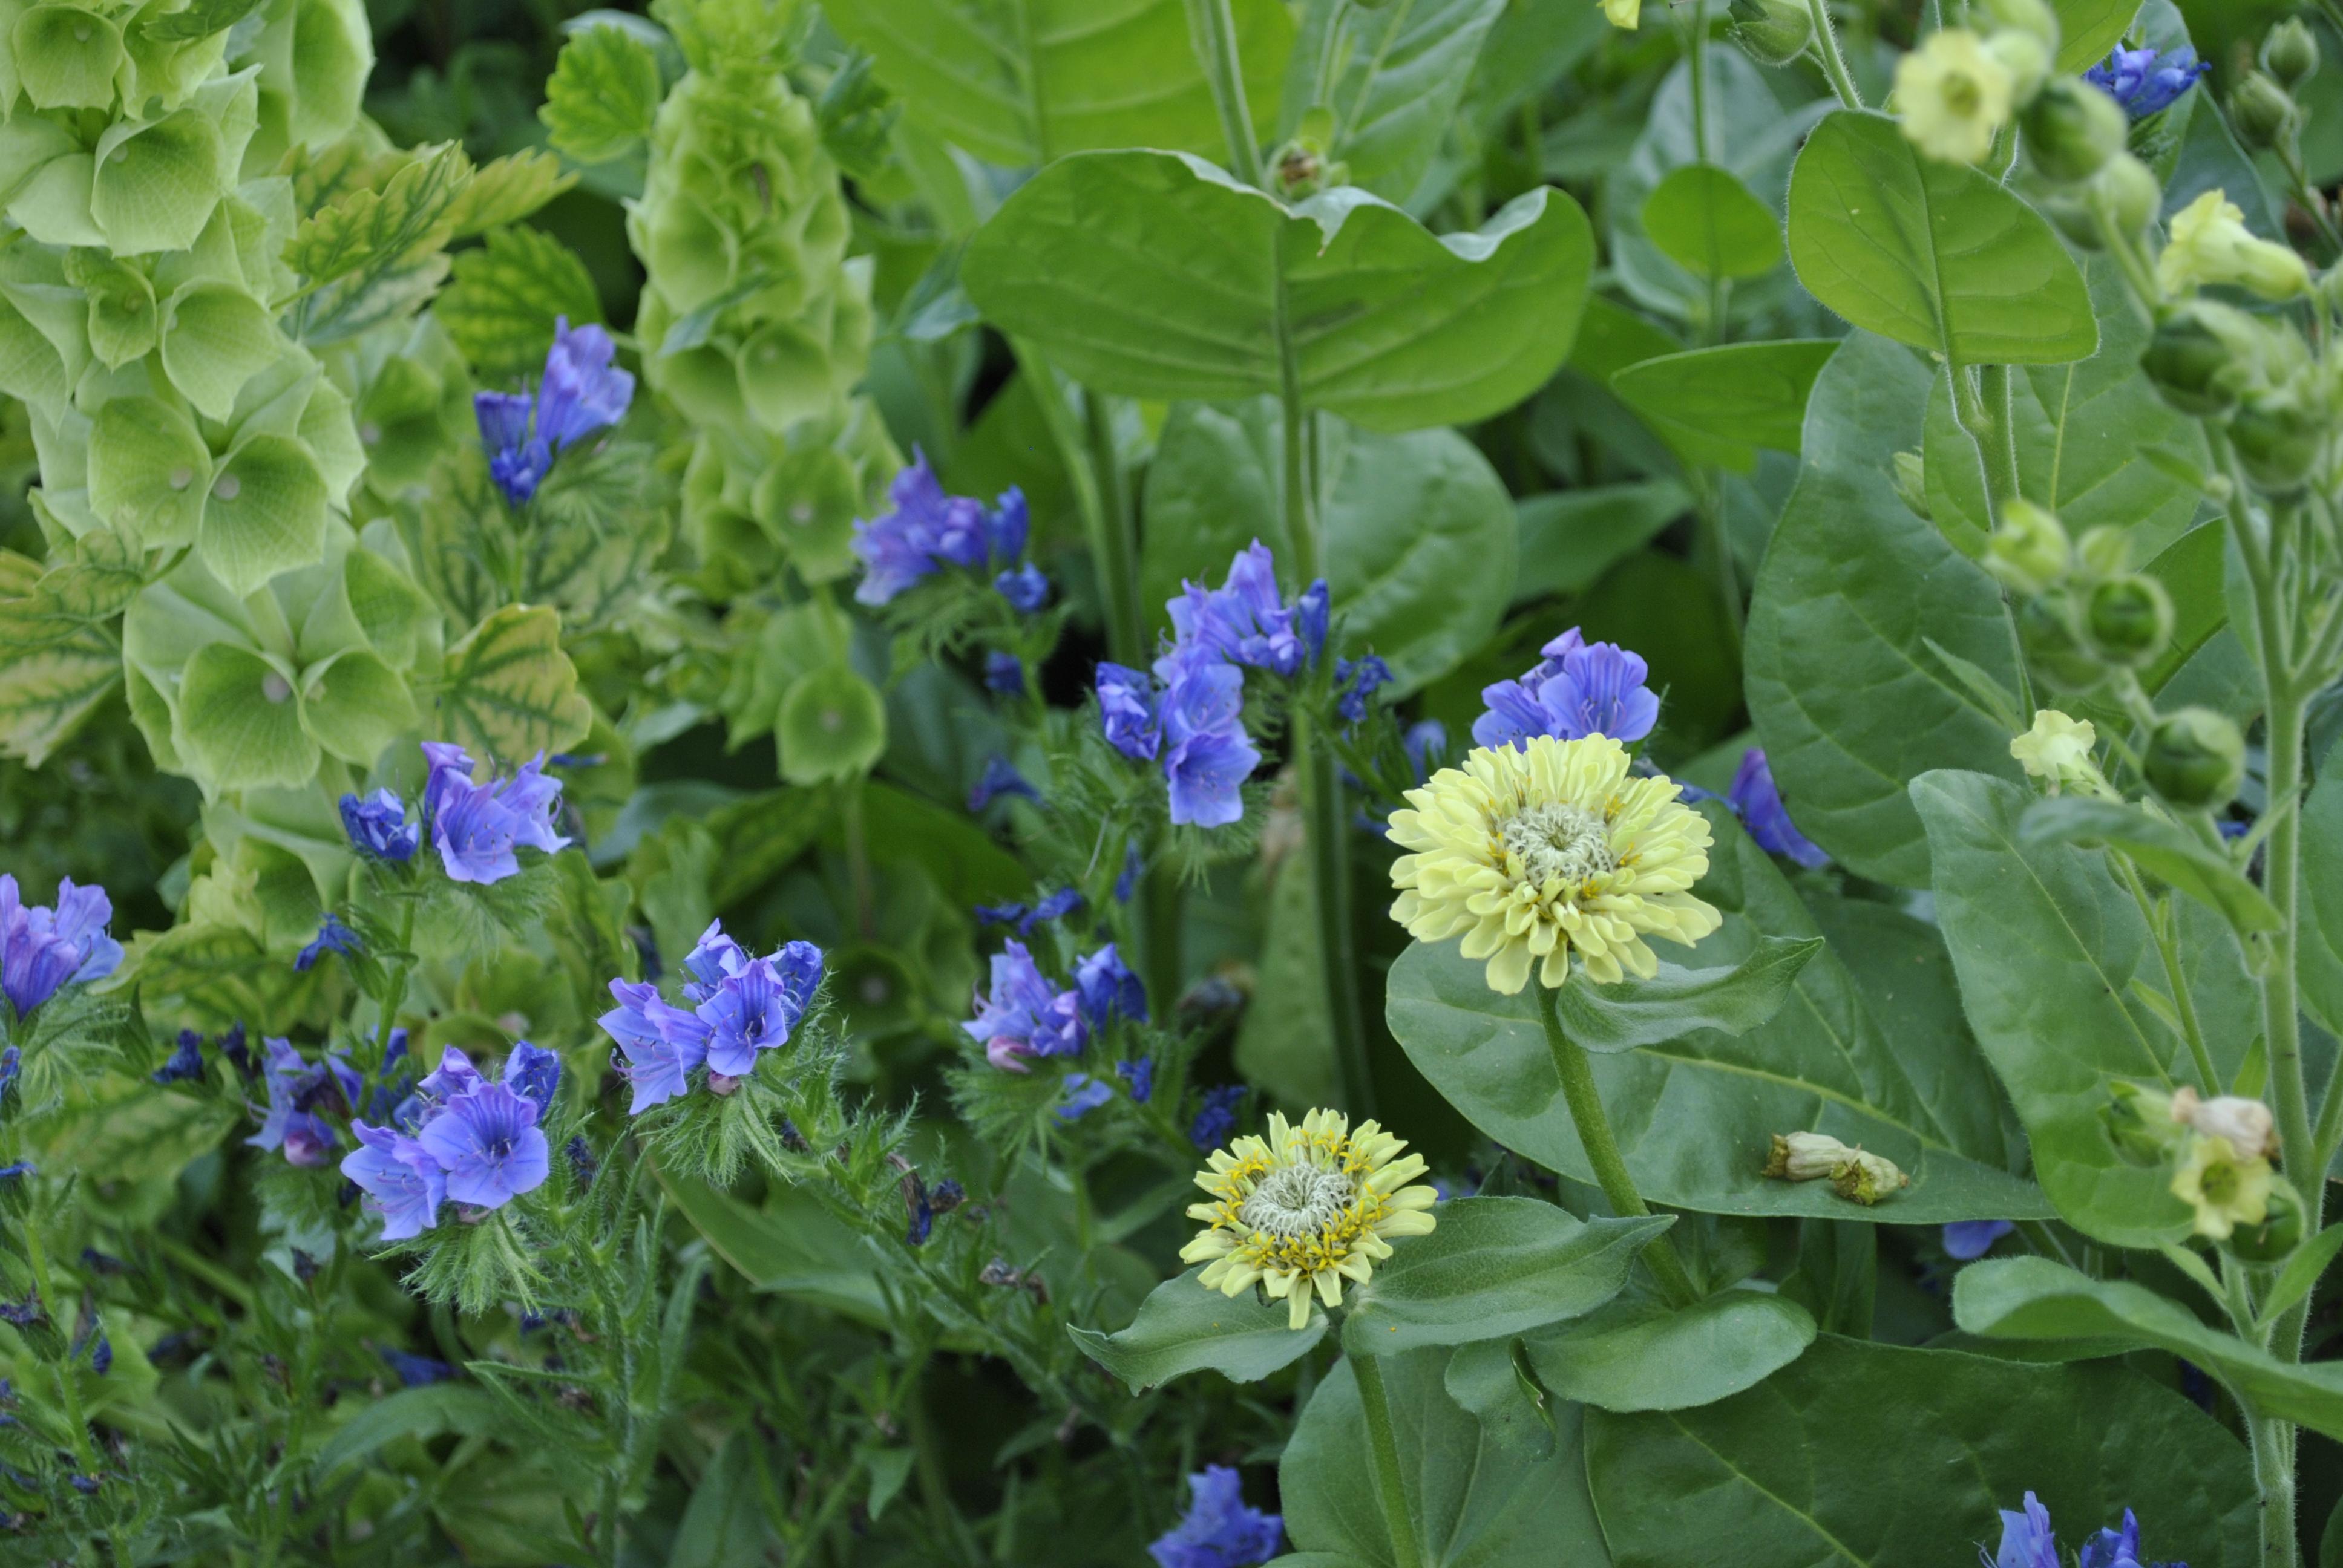 Echium 'Blue Bedder' with Zinnia 'Lime Green' and Bells of Ireland